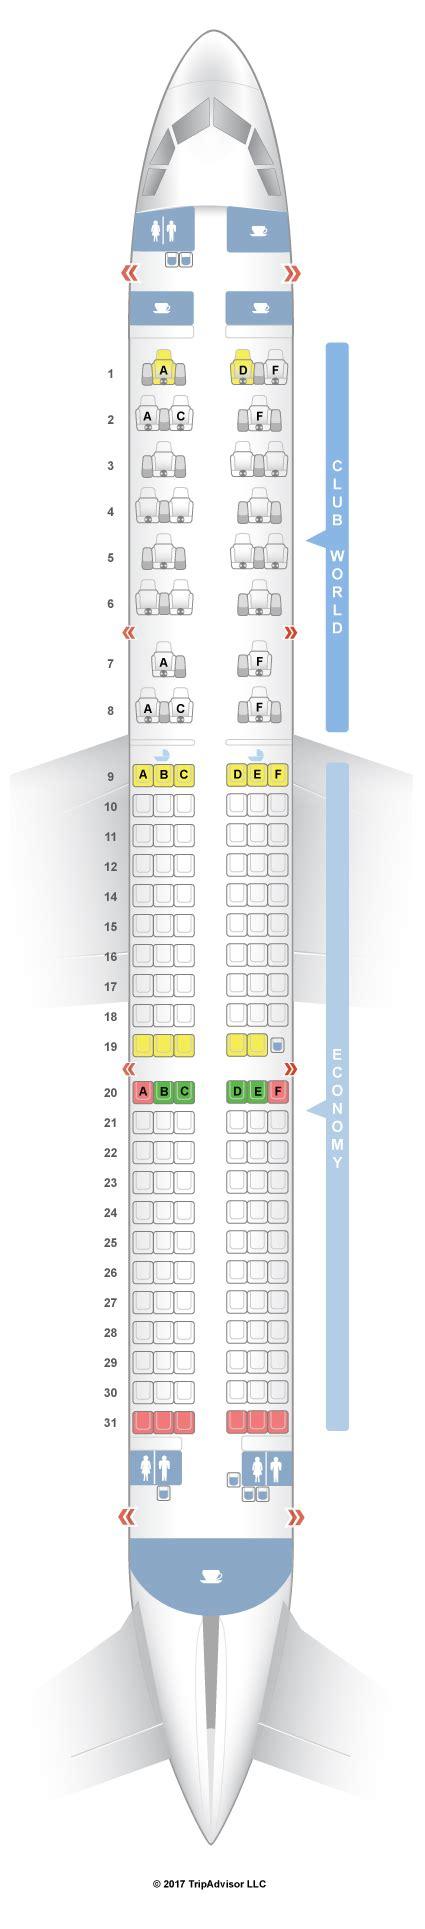 ba a321 seat map seatguru seat map airways airbus a321 321 intl